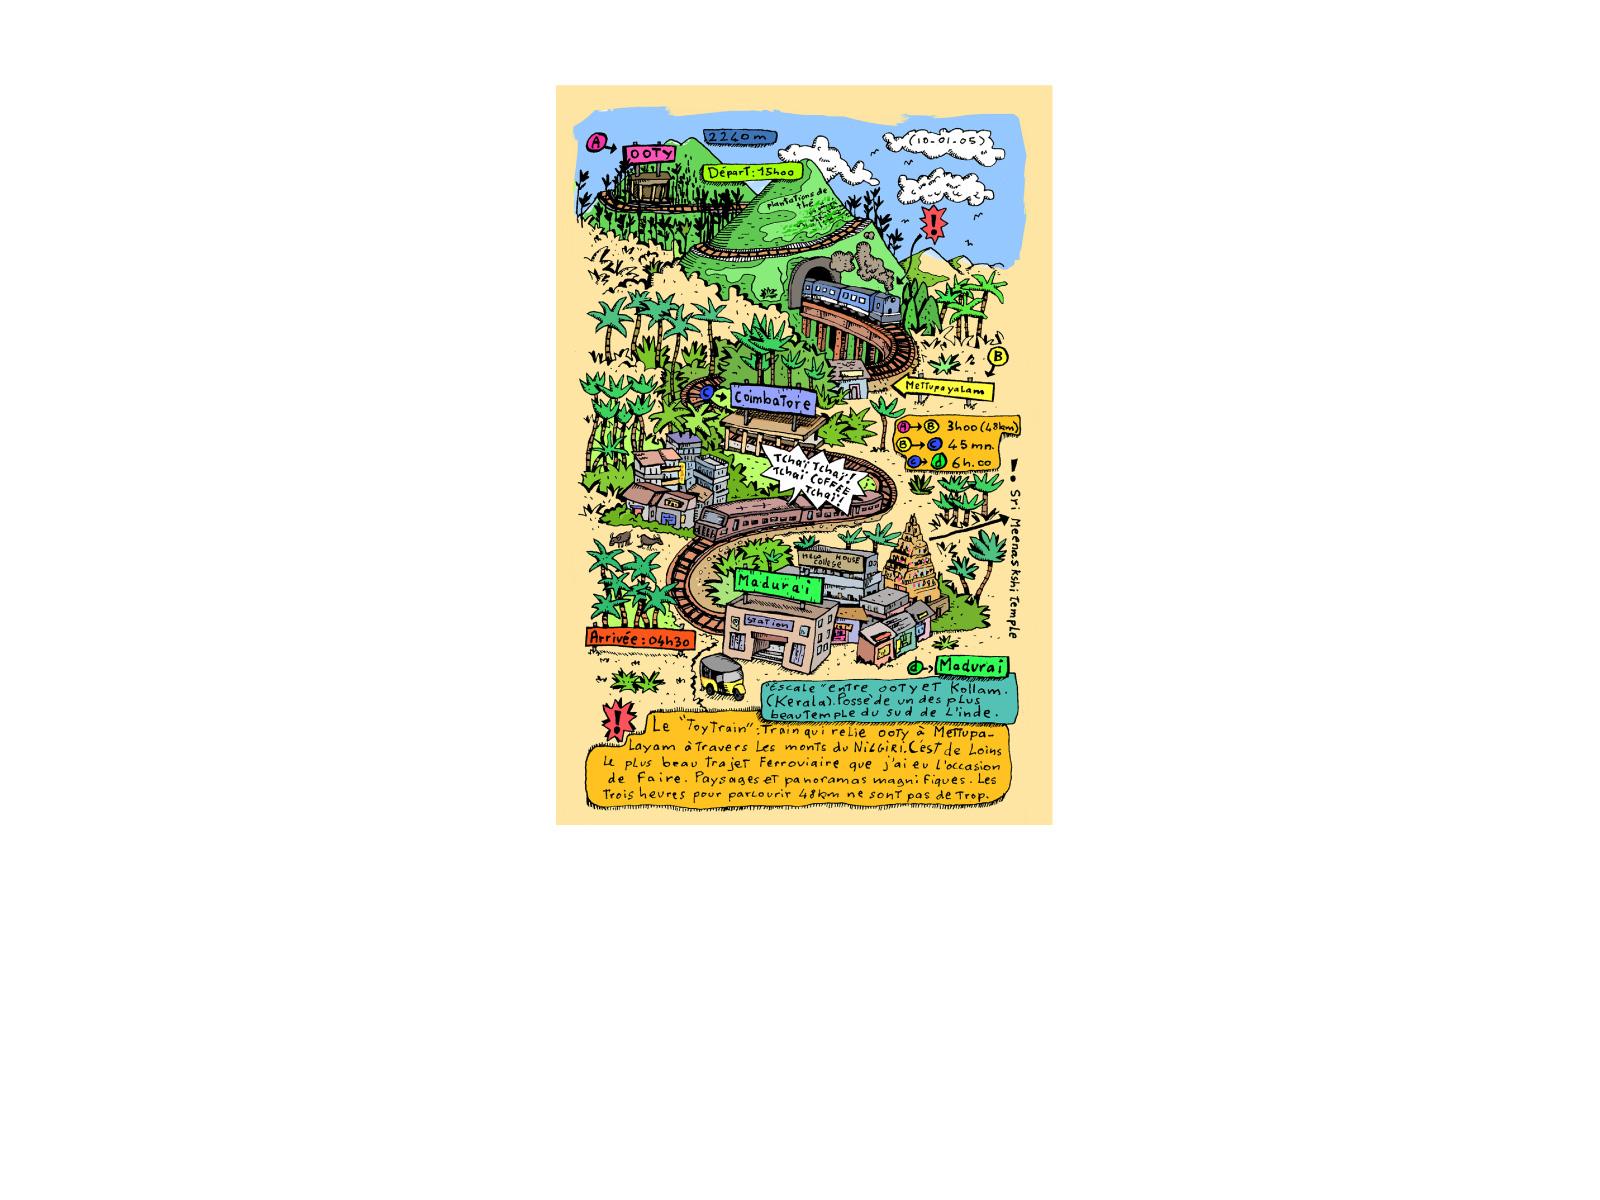 JORG-Illustrations-CARNETS DE VOYAGES-2706